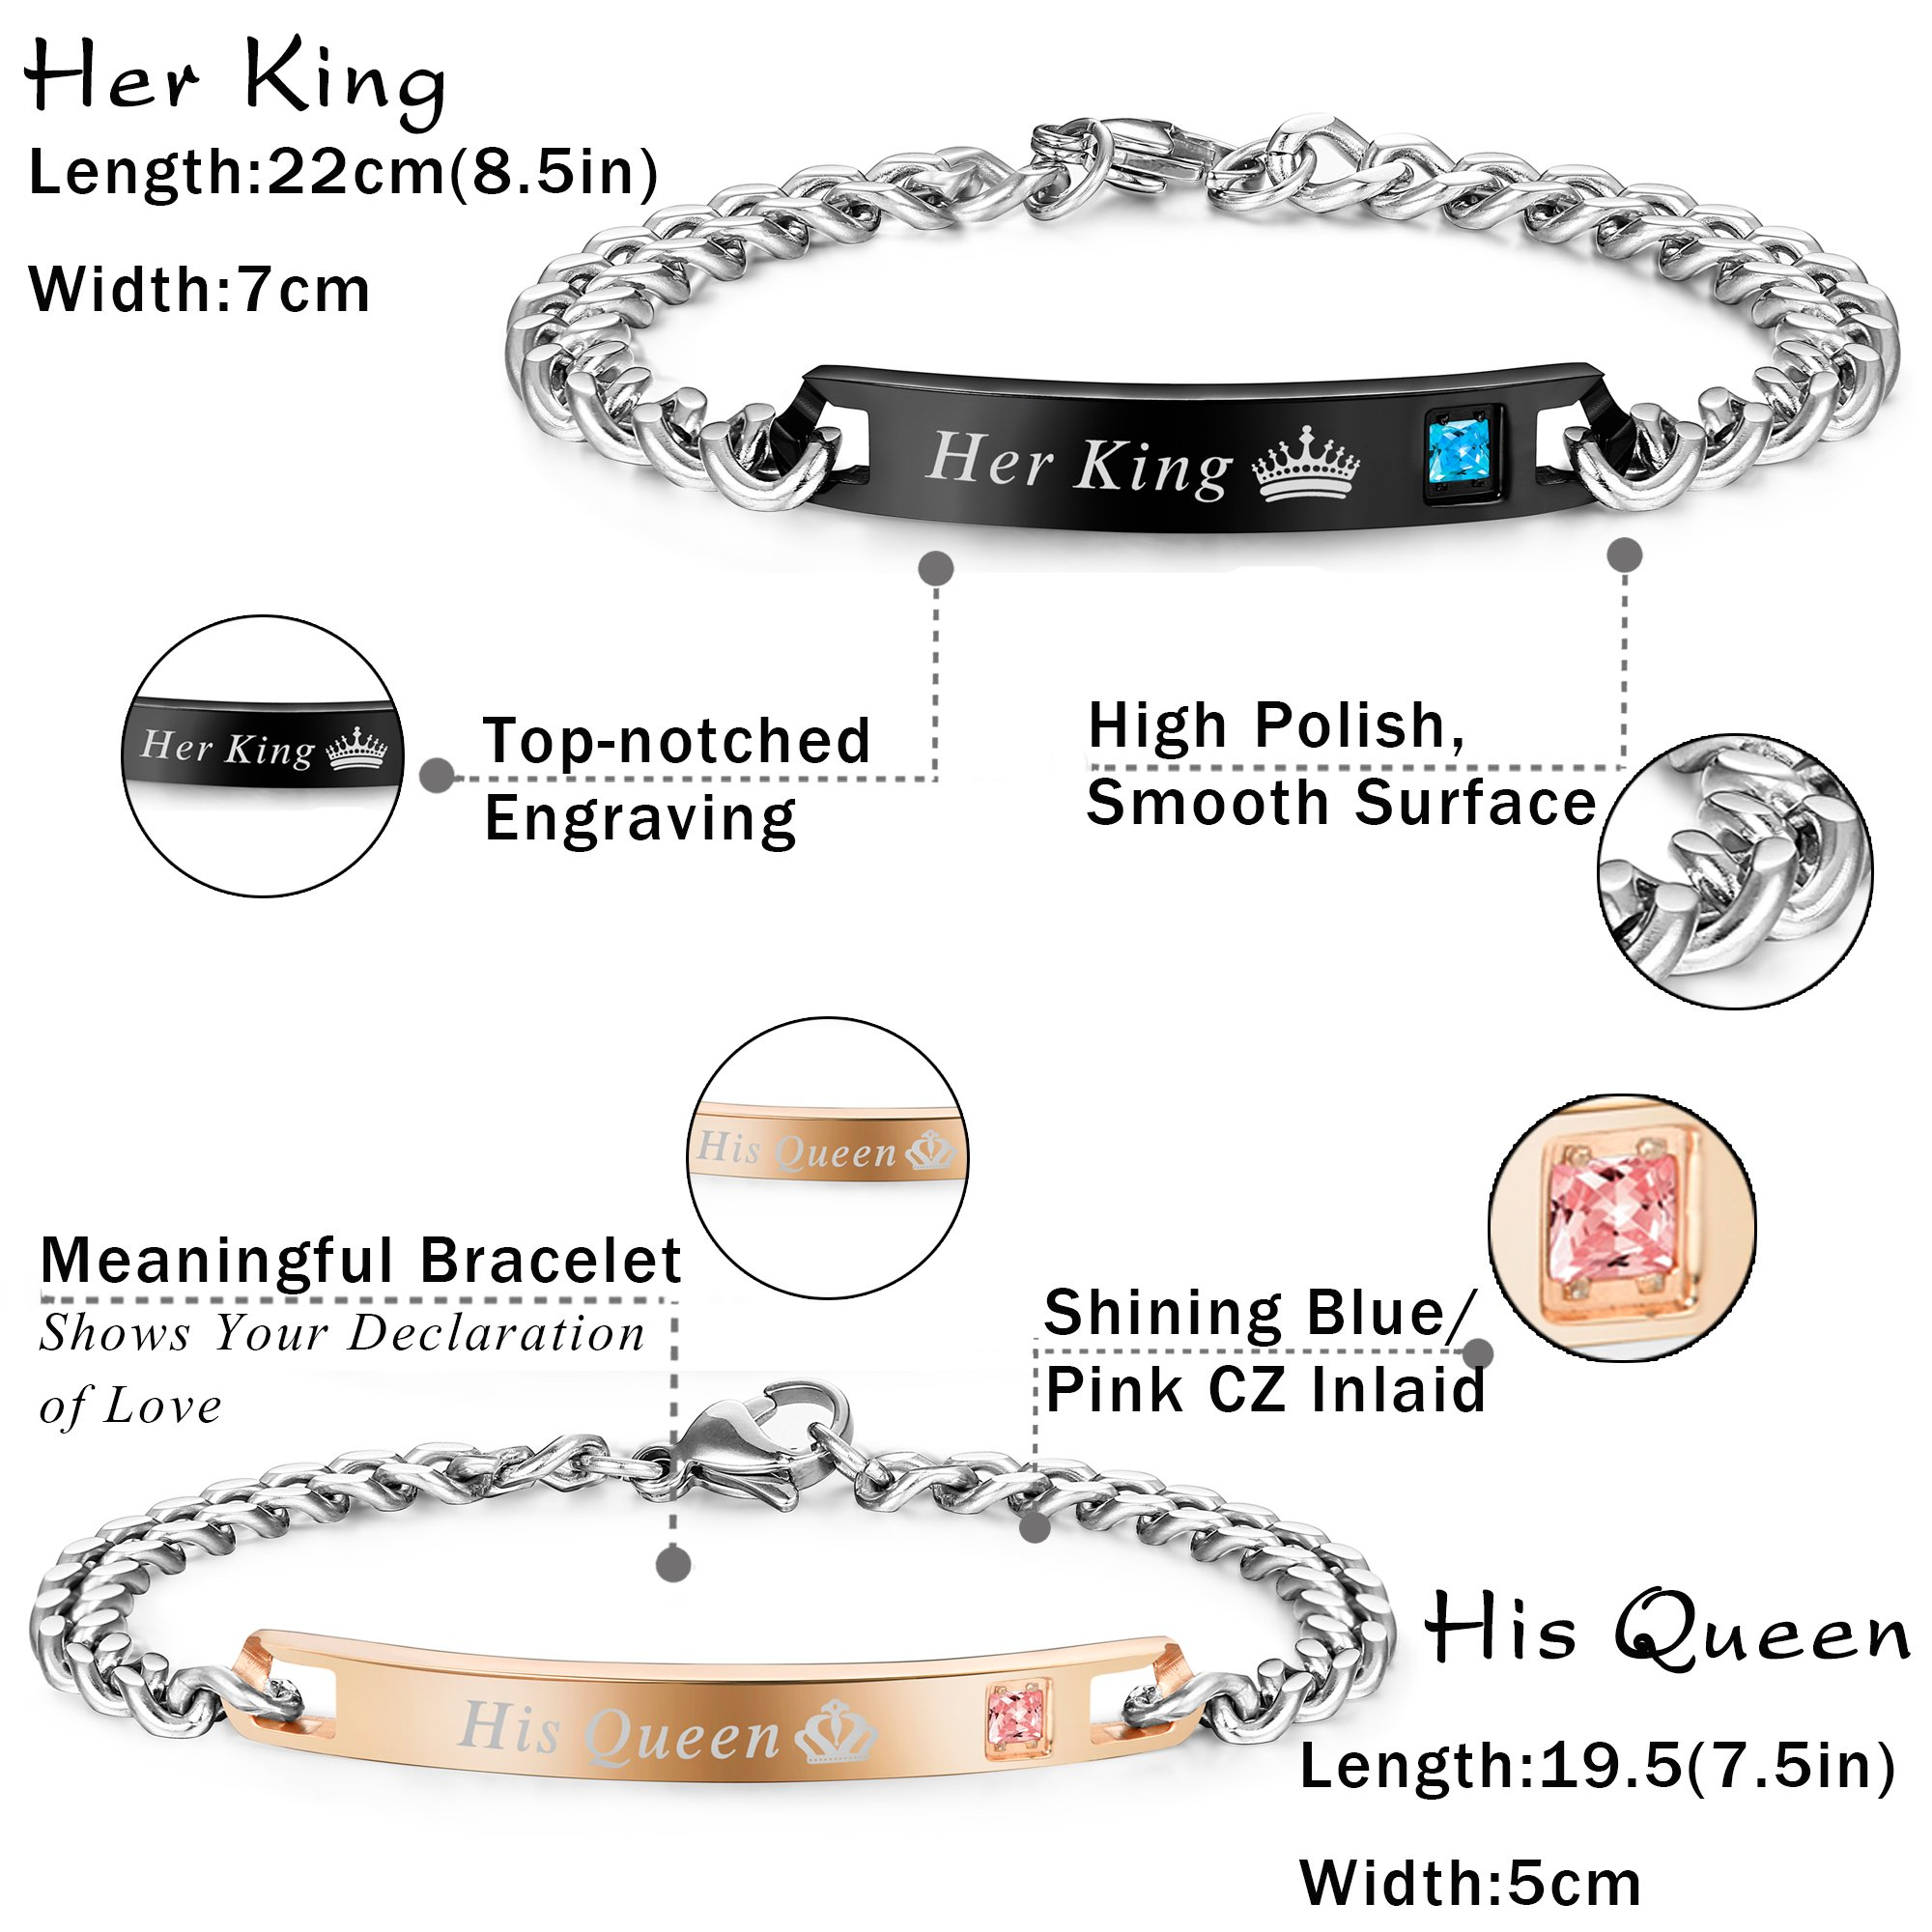 FIBO STEEL 4 Pcs Couples Bracelet for Men Women His & Her Crown Queen Bracelets Set 8mm Beads Bracelets by FIBO STEEL (Image #3)